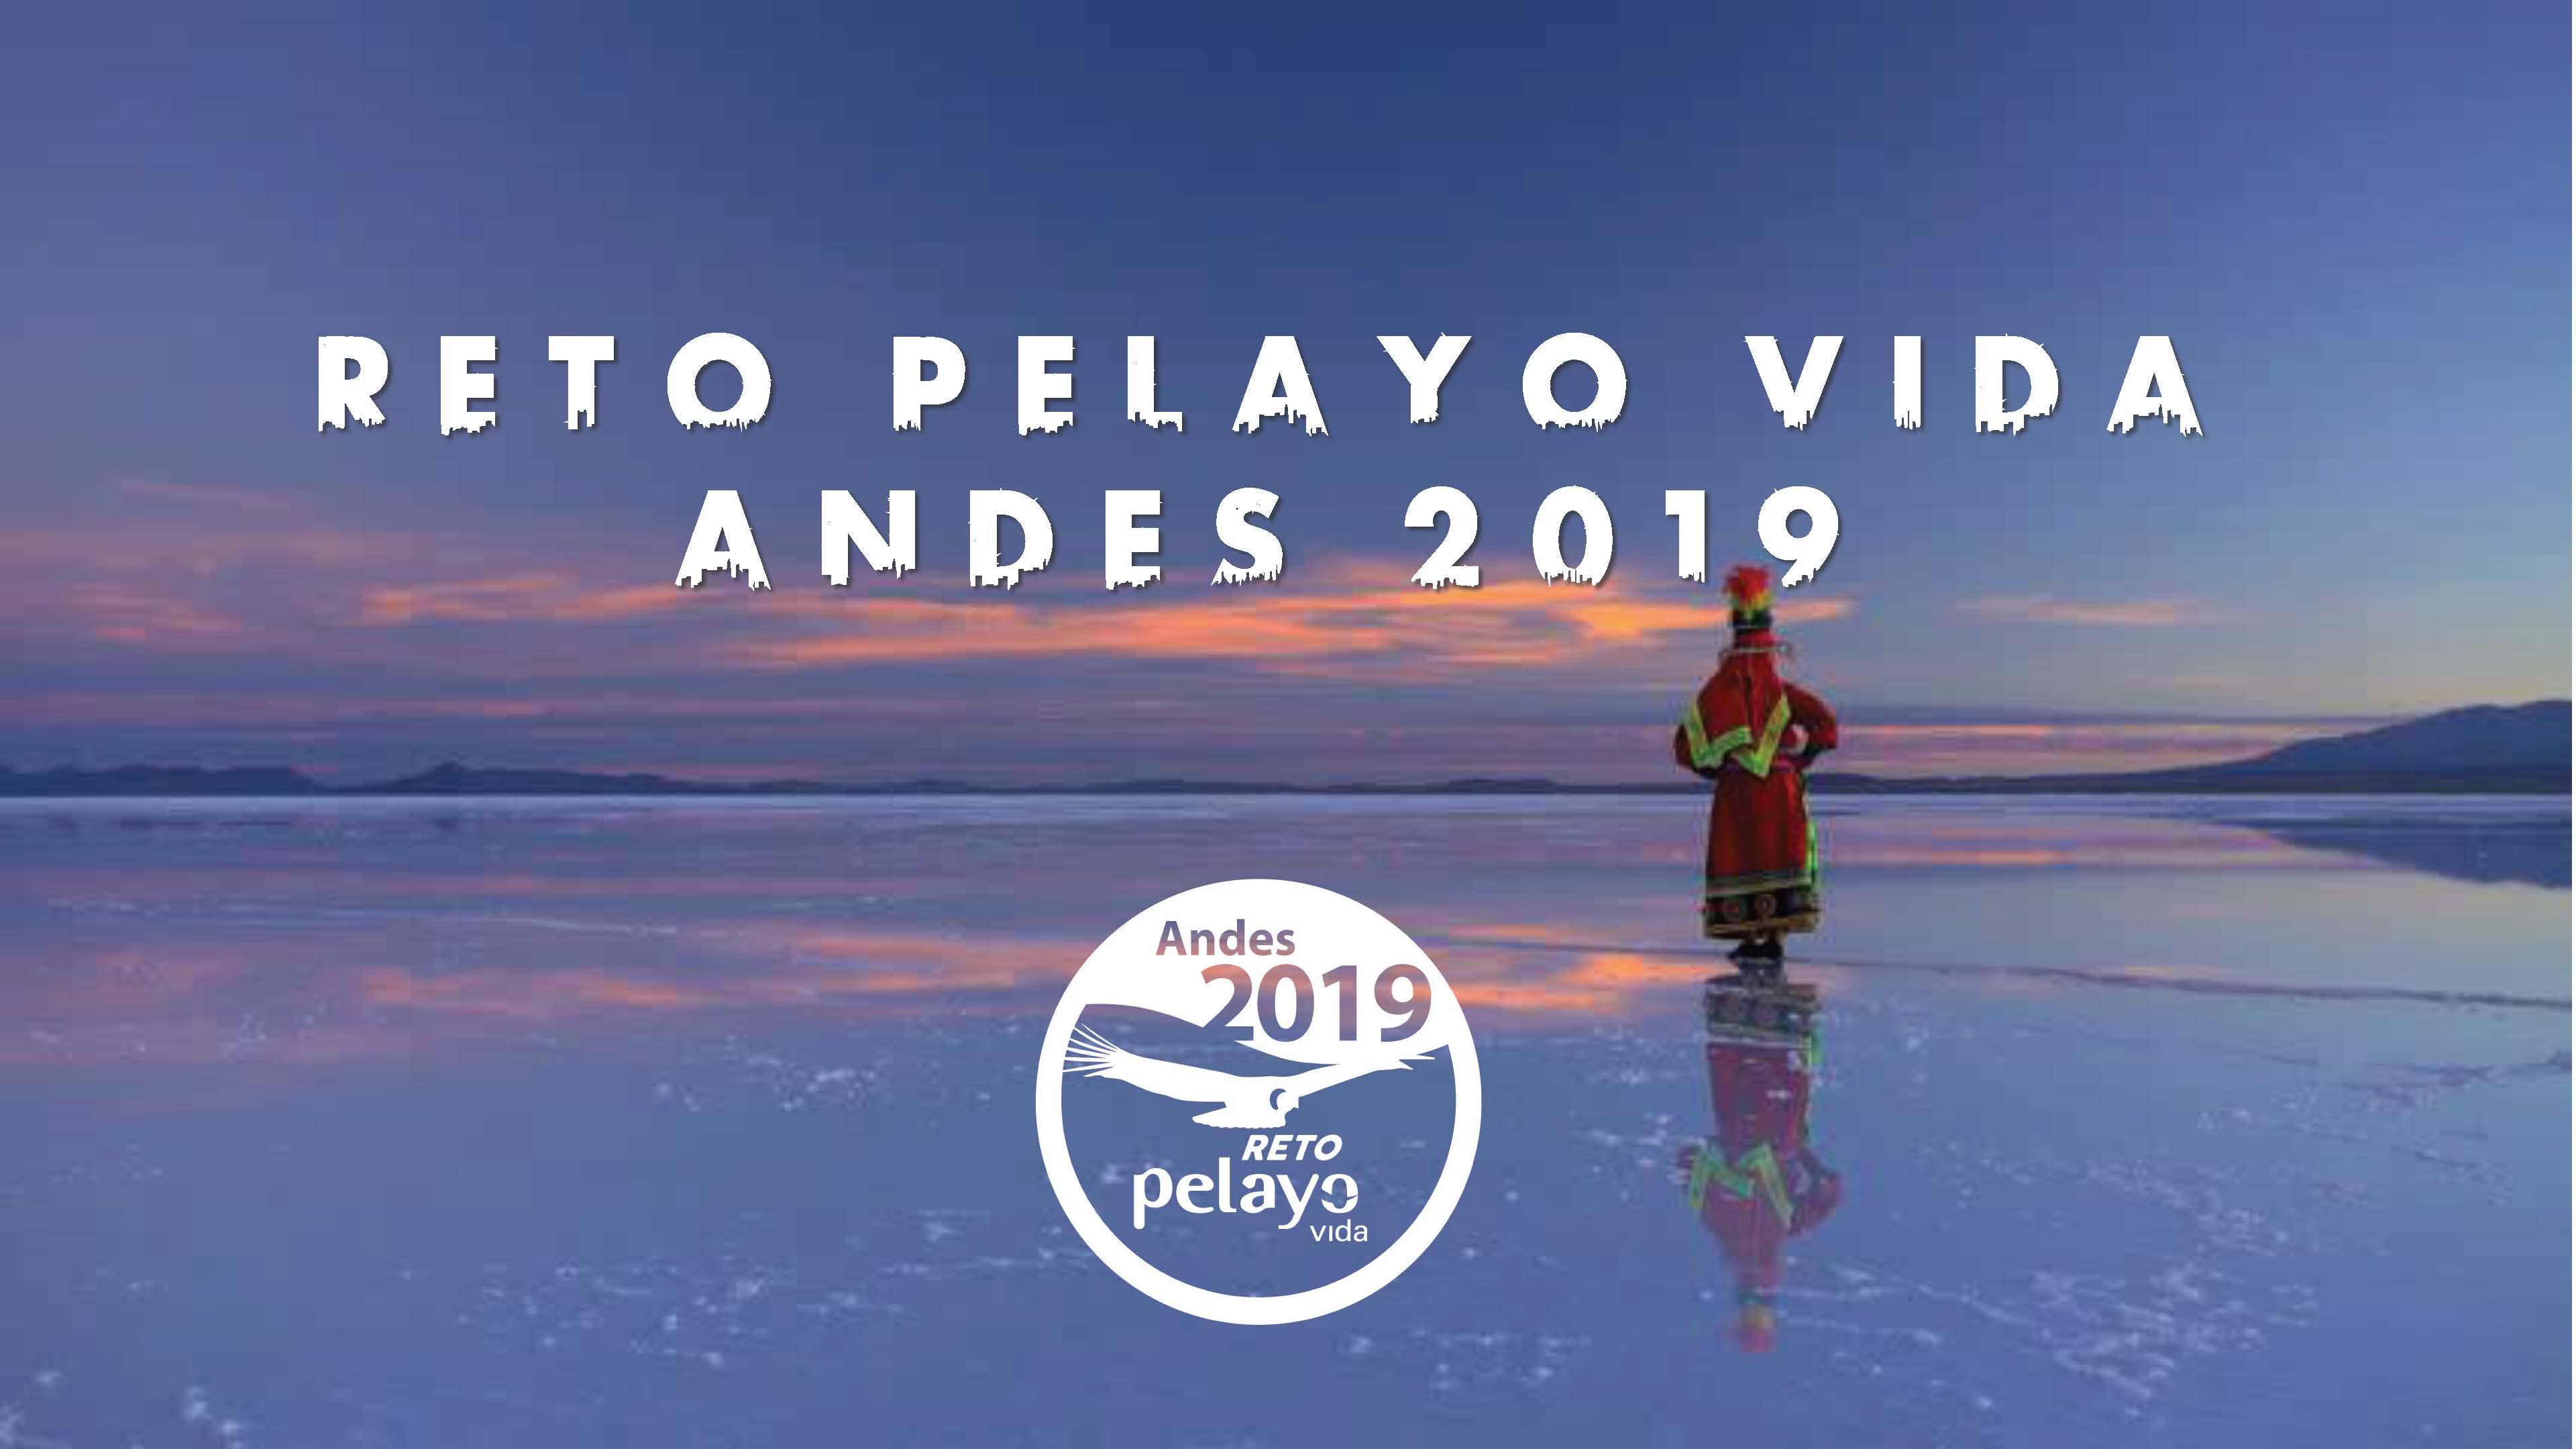 Reto Pelayo Vida Andes 2019